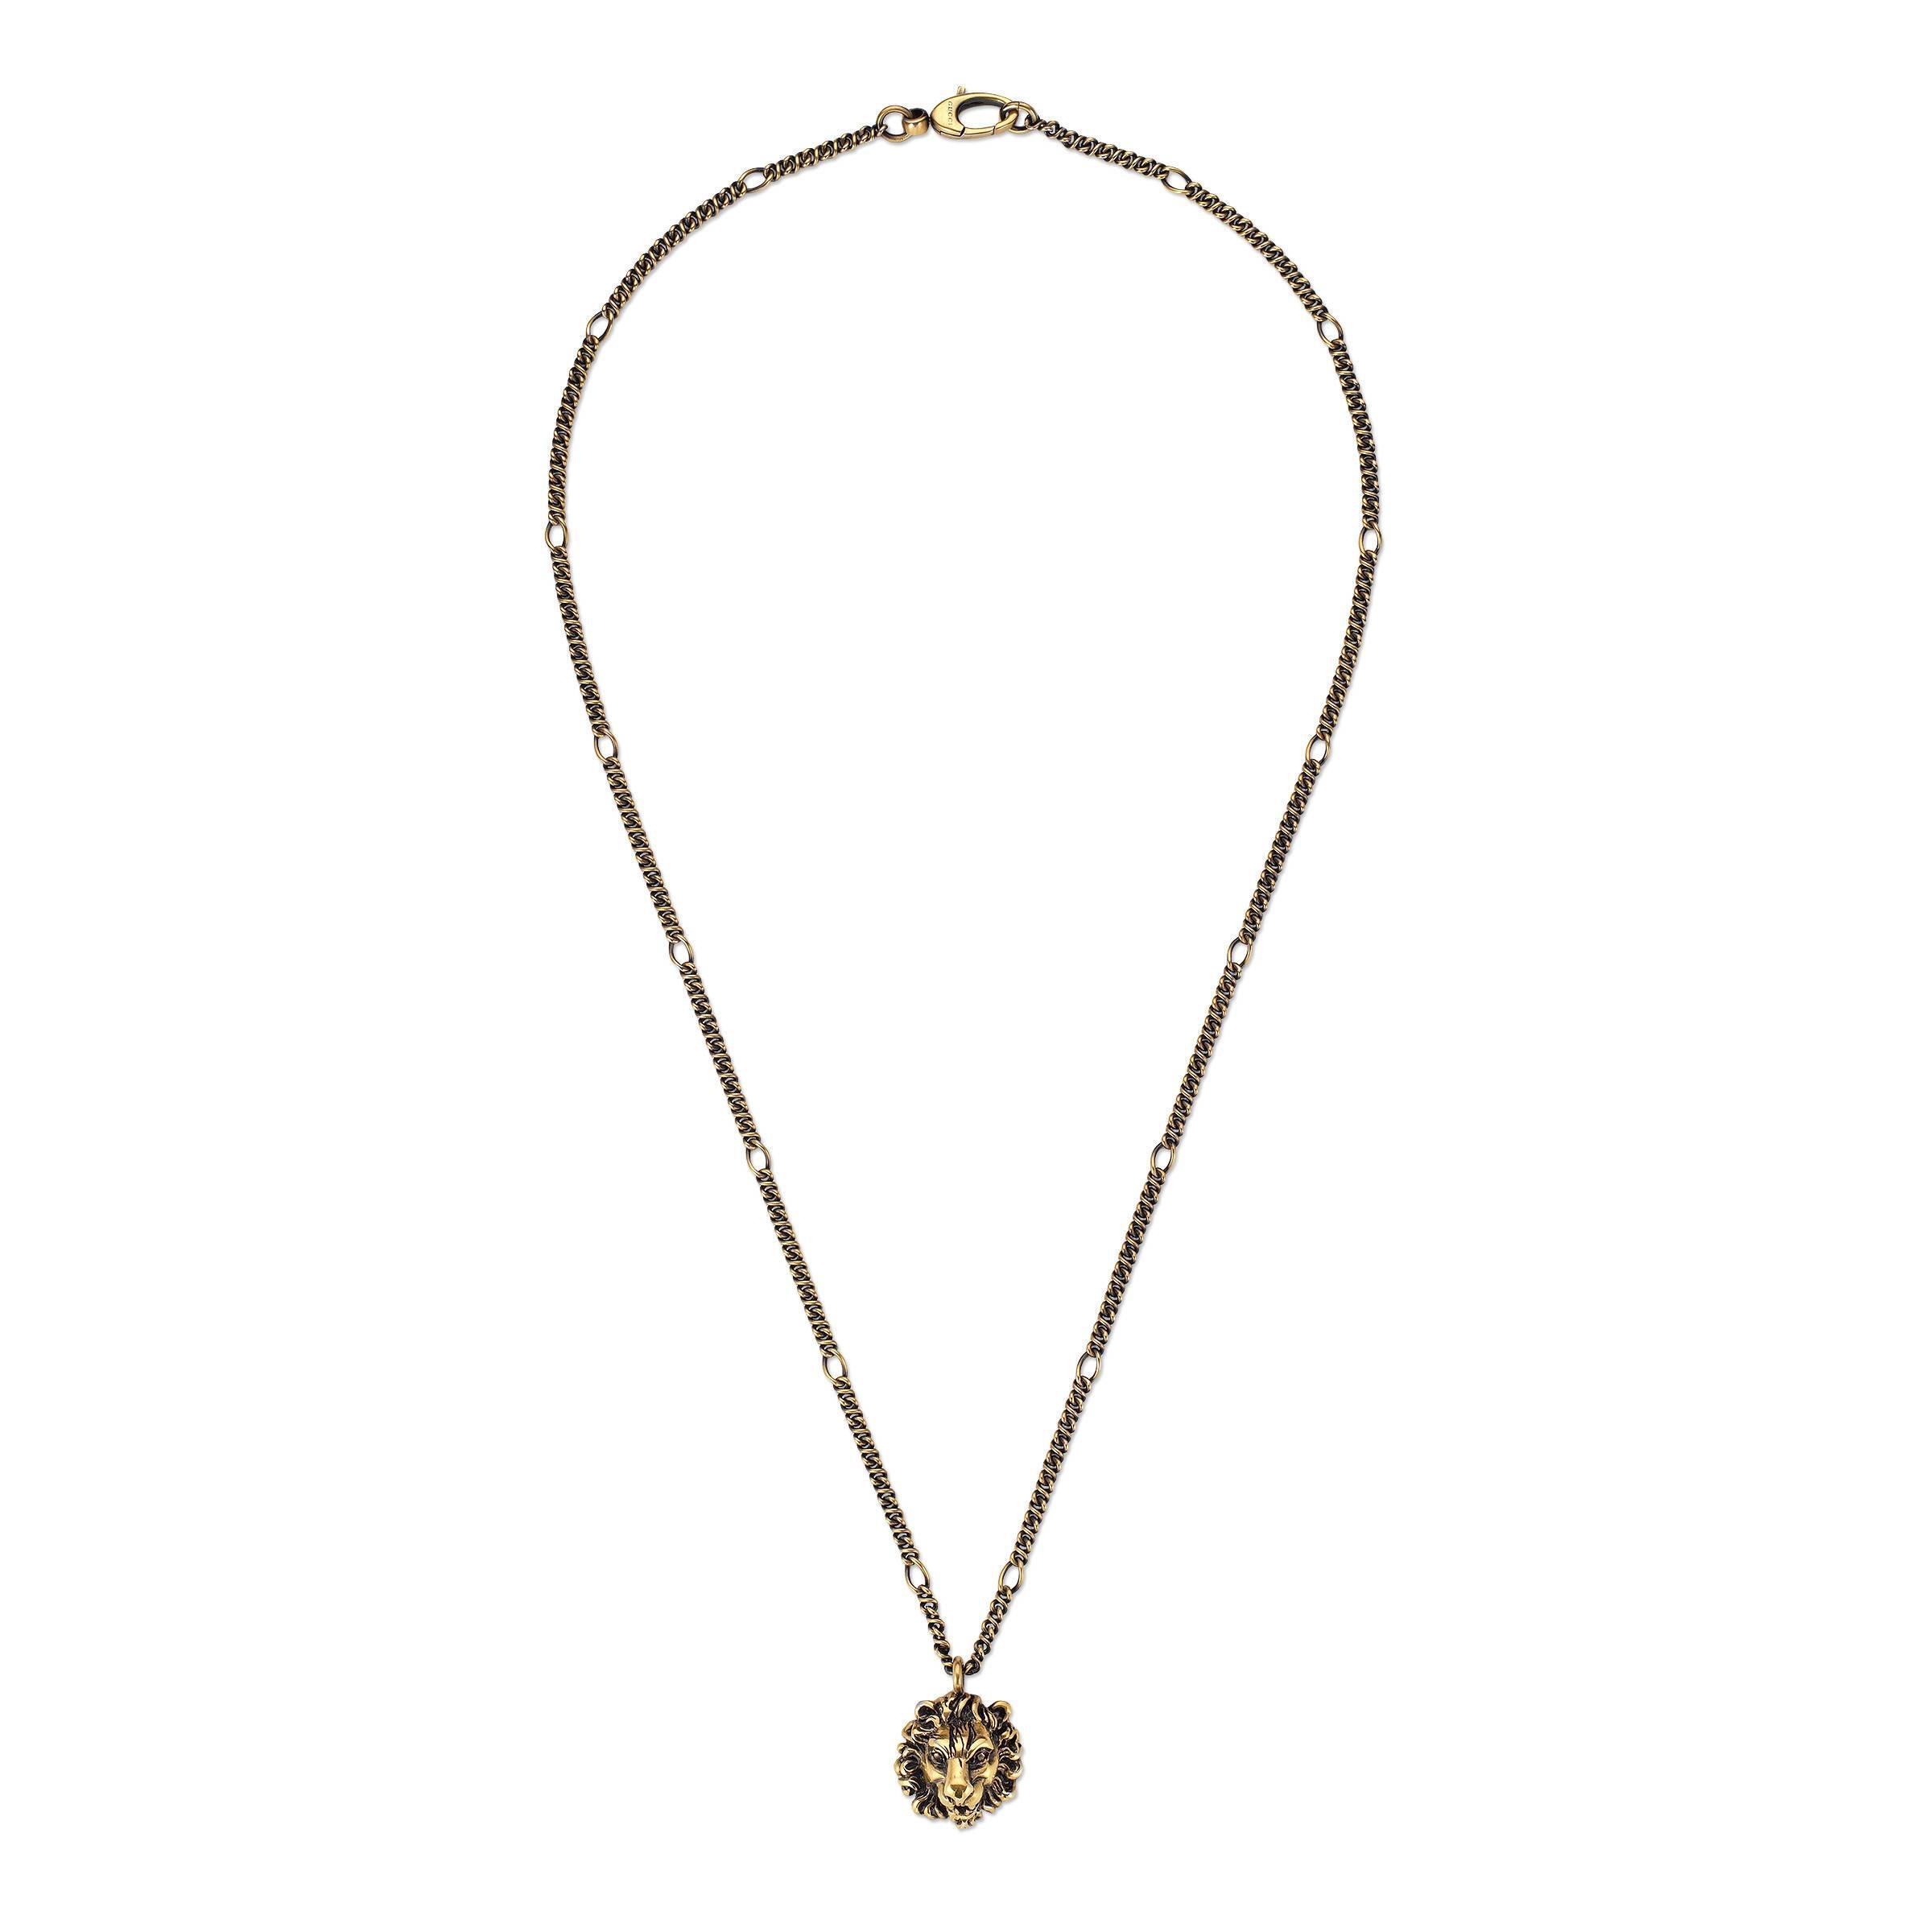 ac650e3fa7a6a3 Gucci - Metallic Necklace With Lion Head Pendant - Lyst. View fullscreen